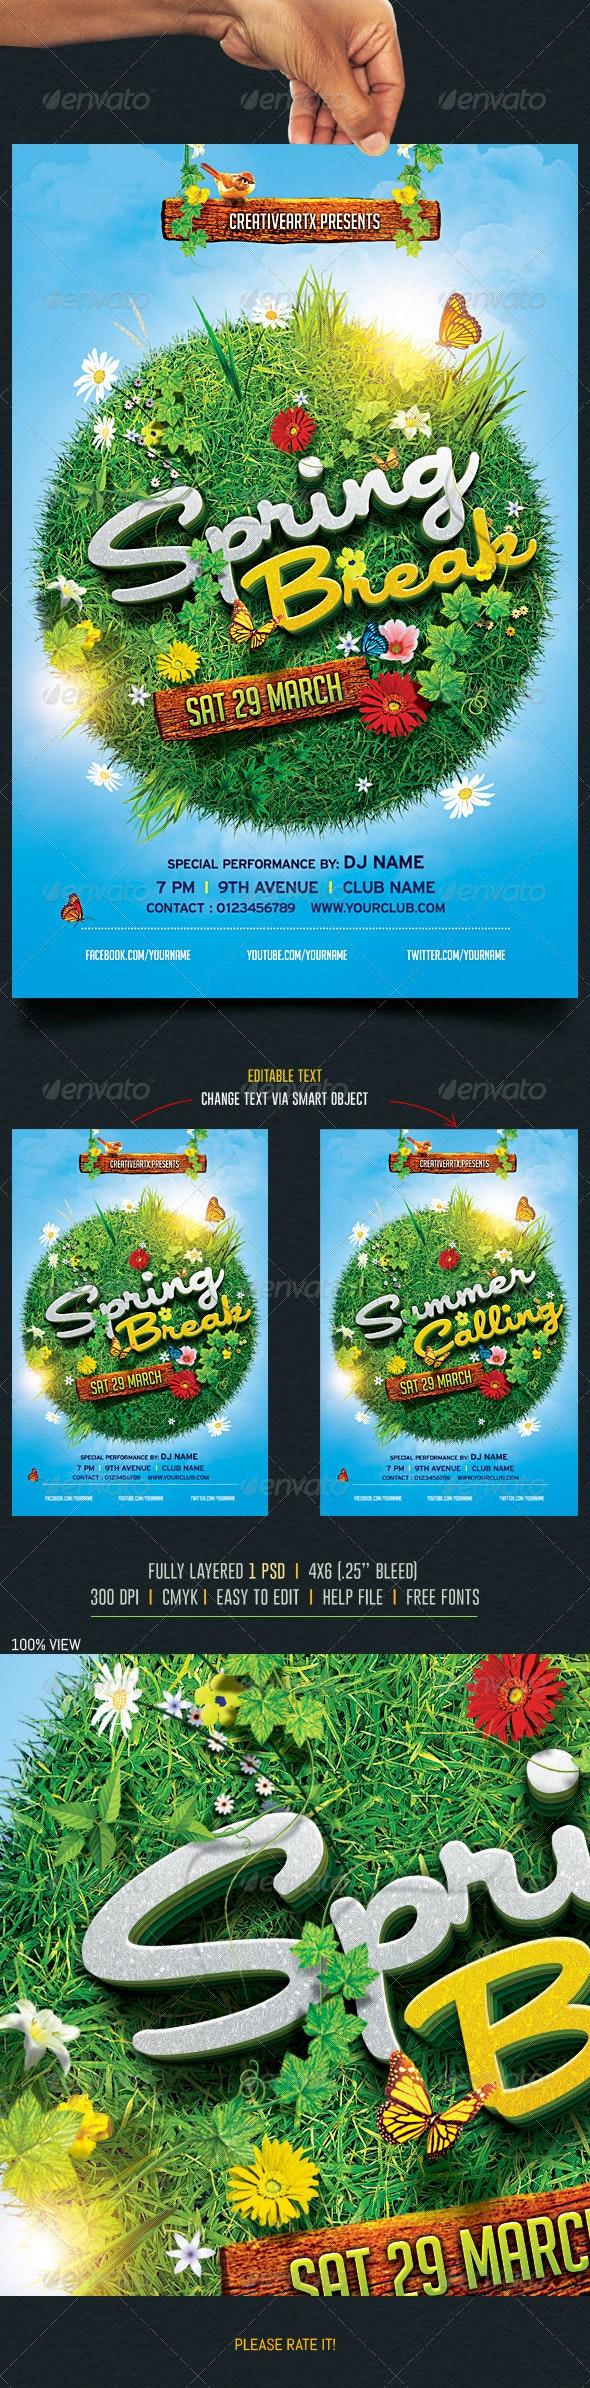 Spring Break / Summer Party Flyer 2 - Events Flyers